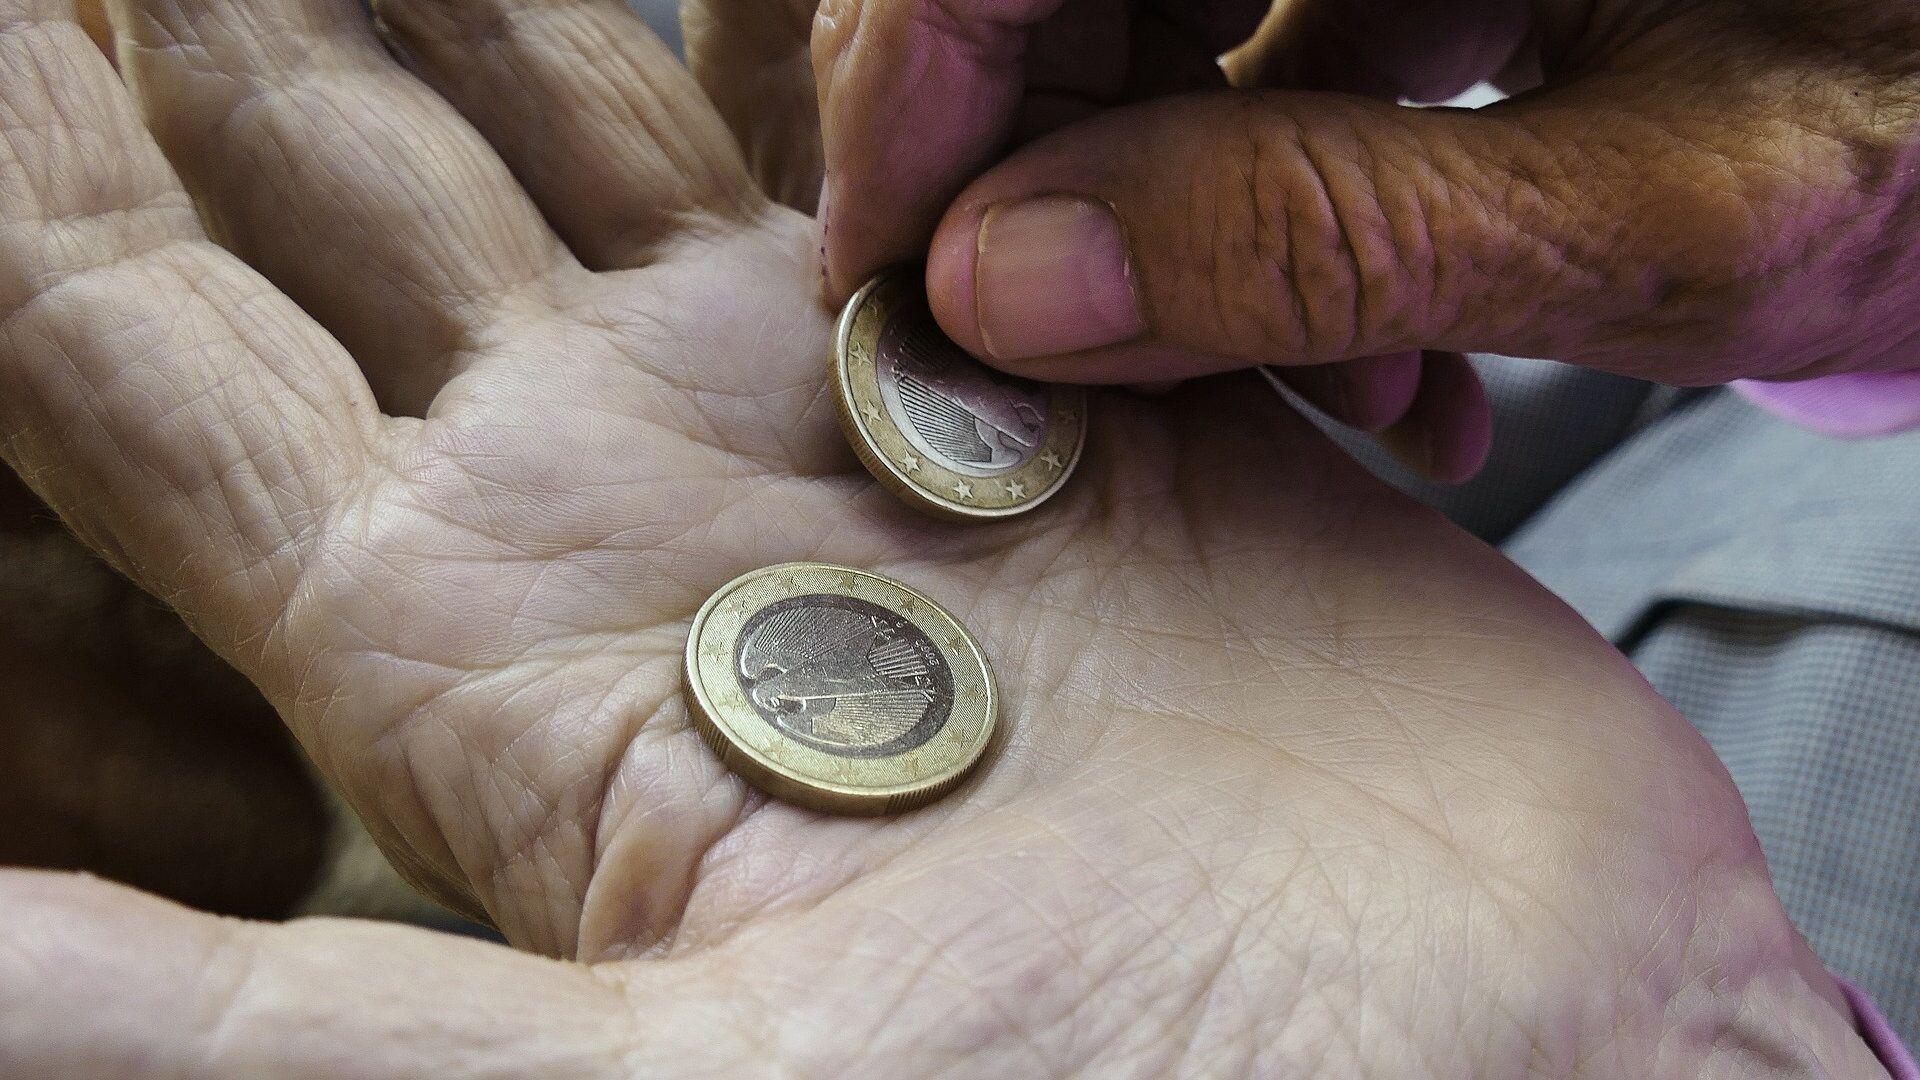 Пенсионеры, деньги - Sputnik Latvija, 1920, 14.10.2021